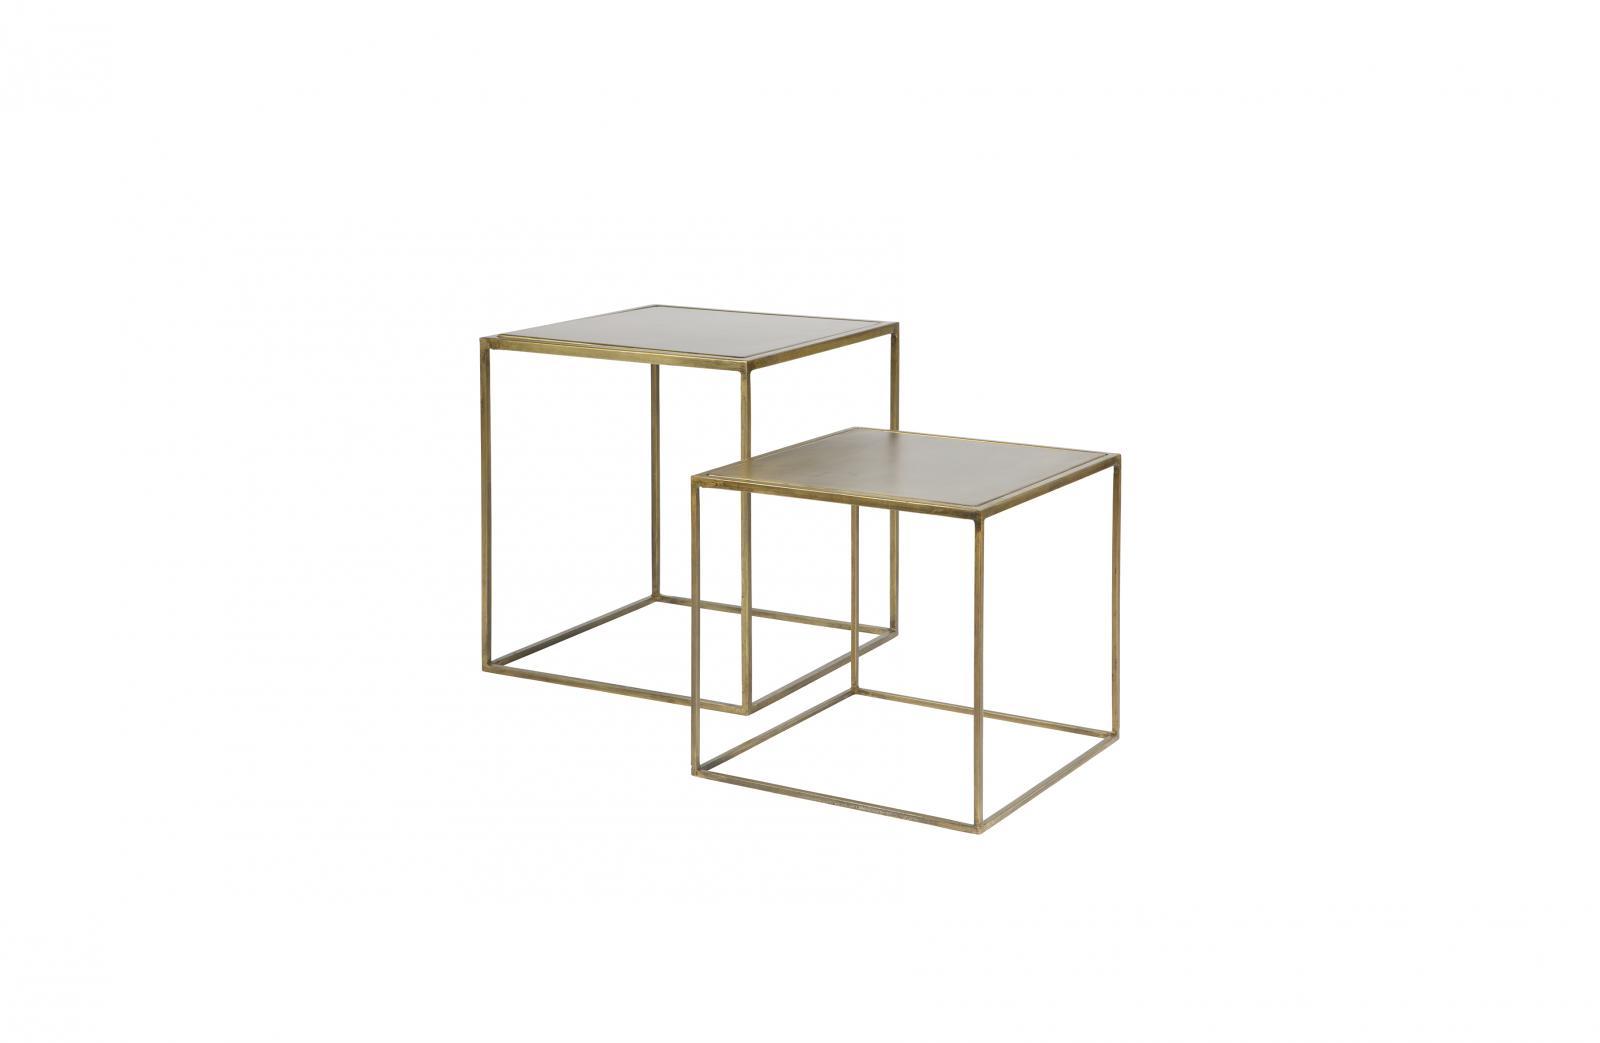 bepurehome 2er set metallic beistelltisch gro e metall messing. Black Bedroom Furniture Sets. Home Design Ideas